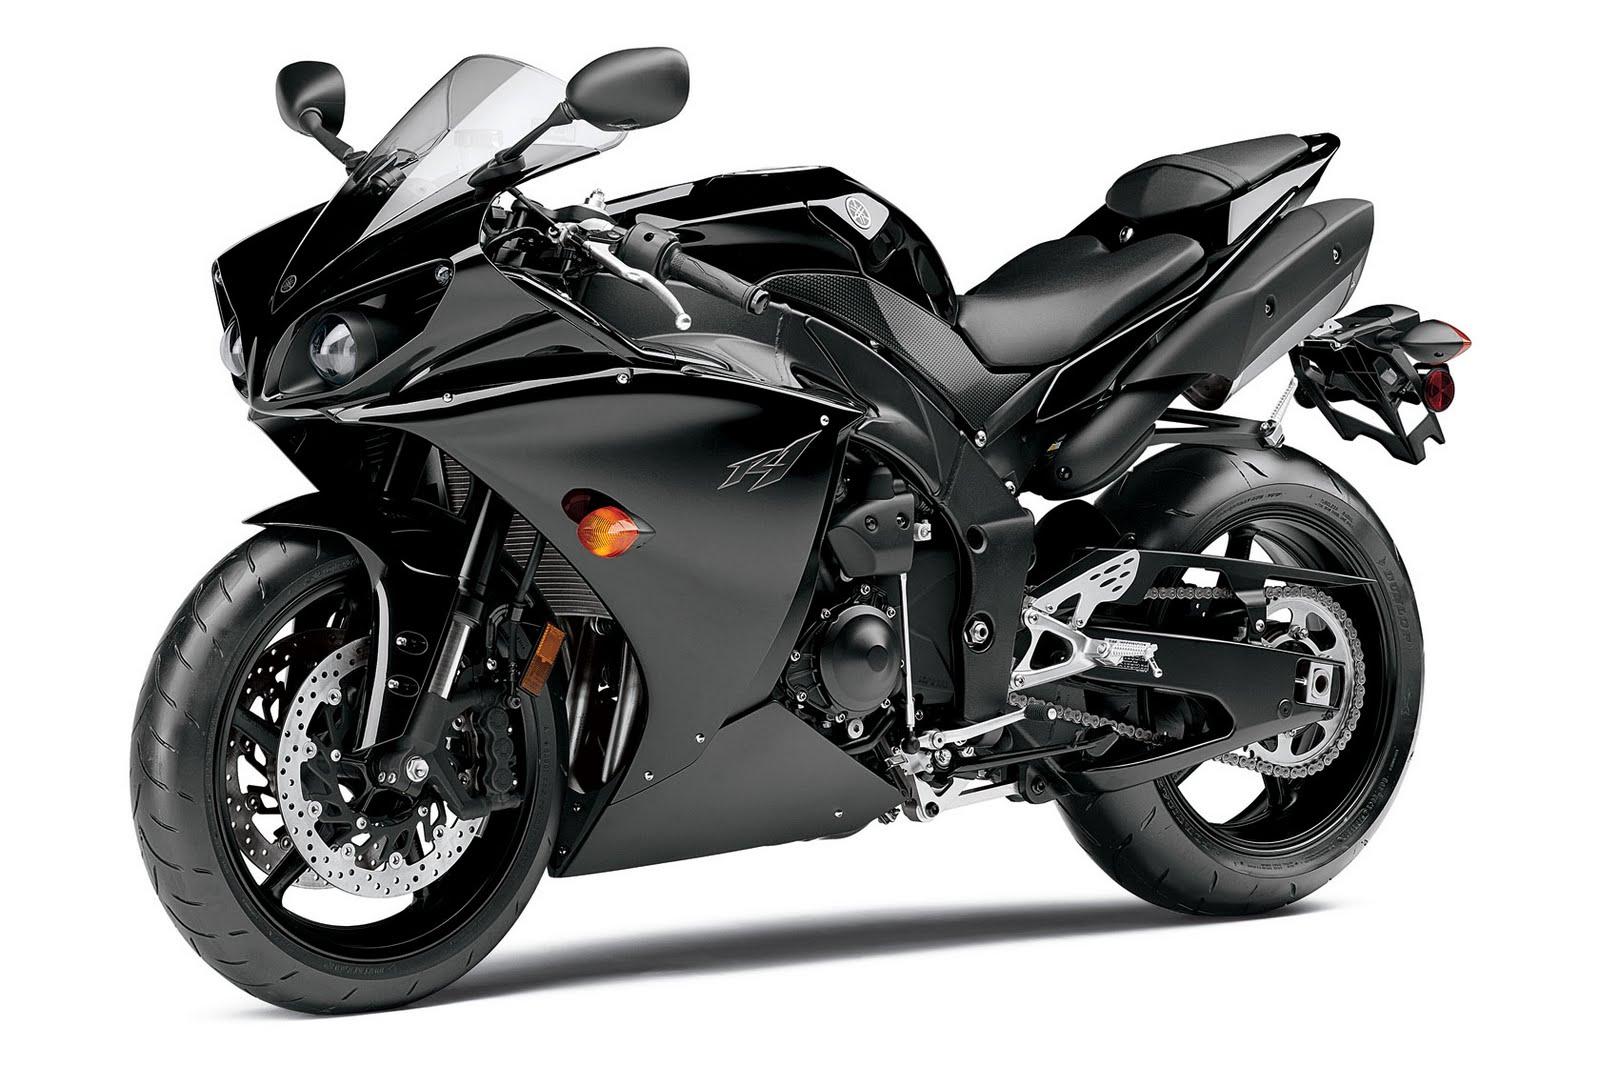 Image of Gambar Motor Ninja 250